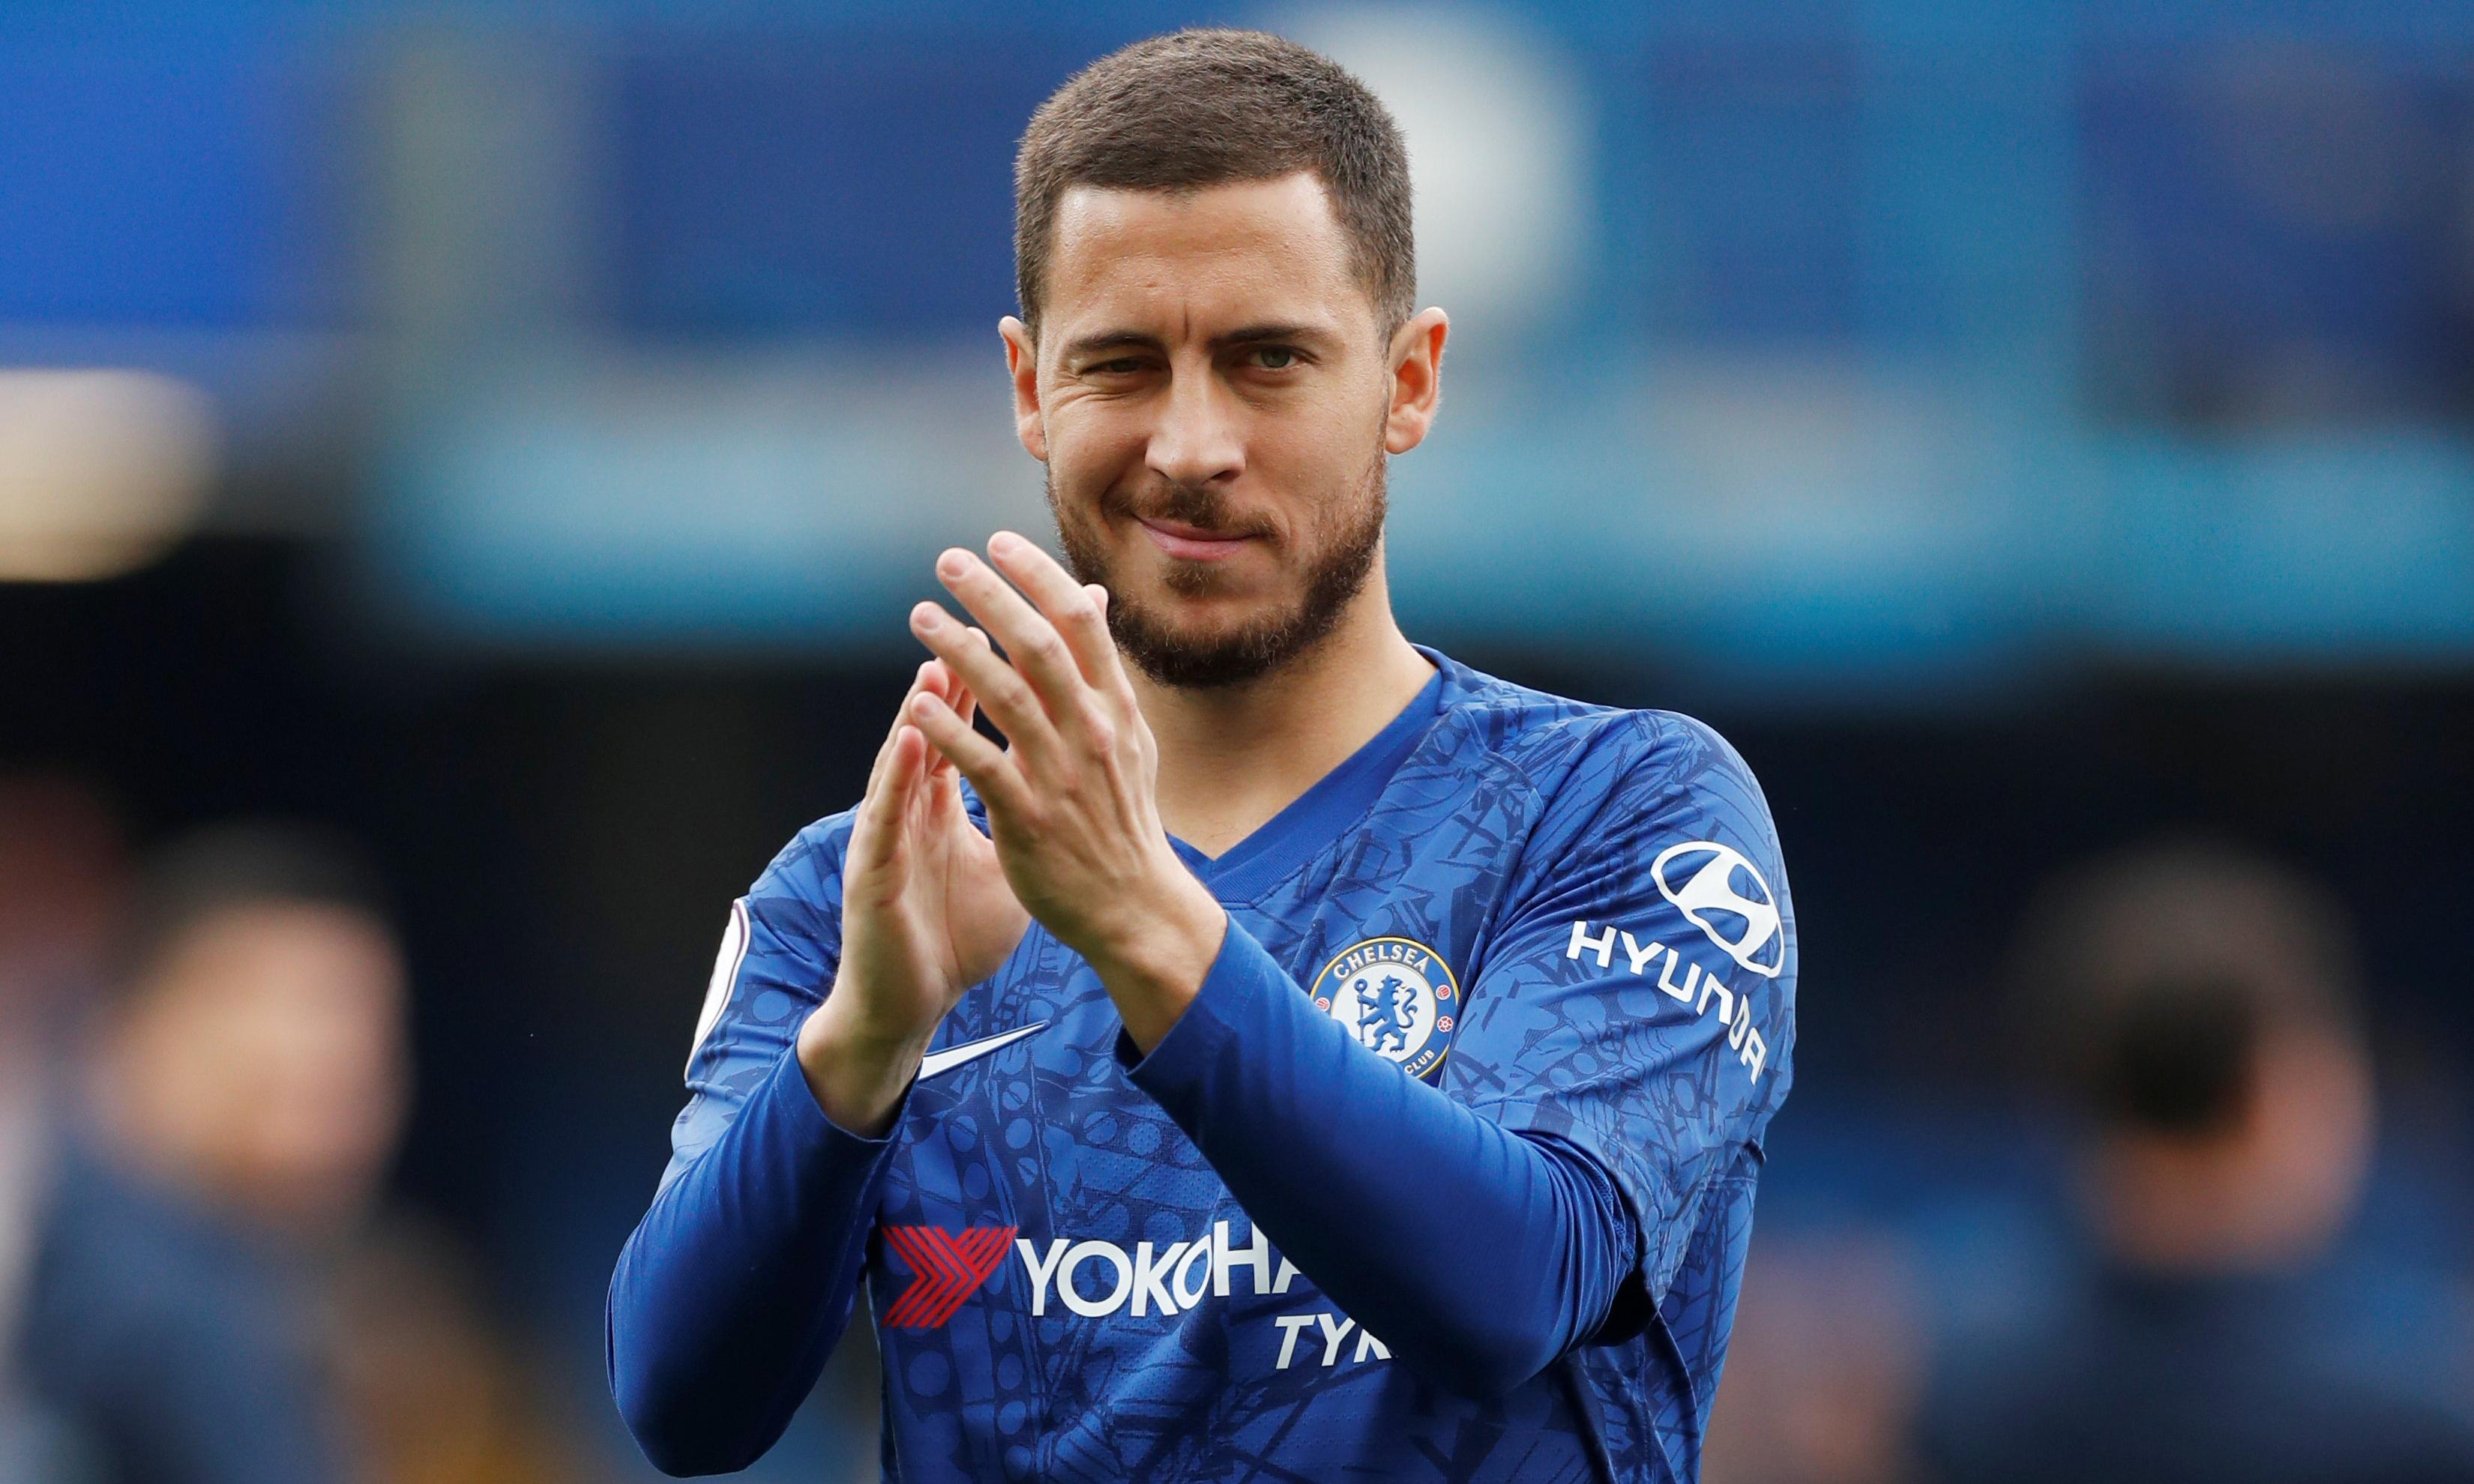 Chelsea's waltzing wizard Eden Hazard hopes for one last dance